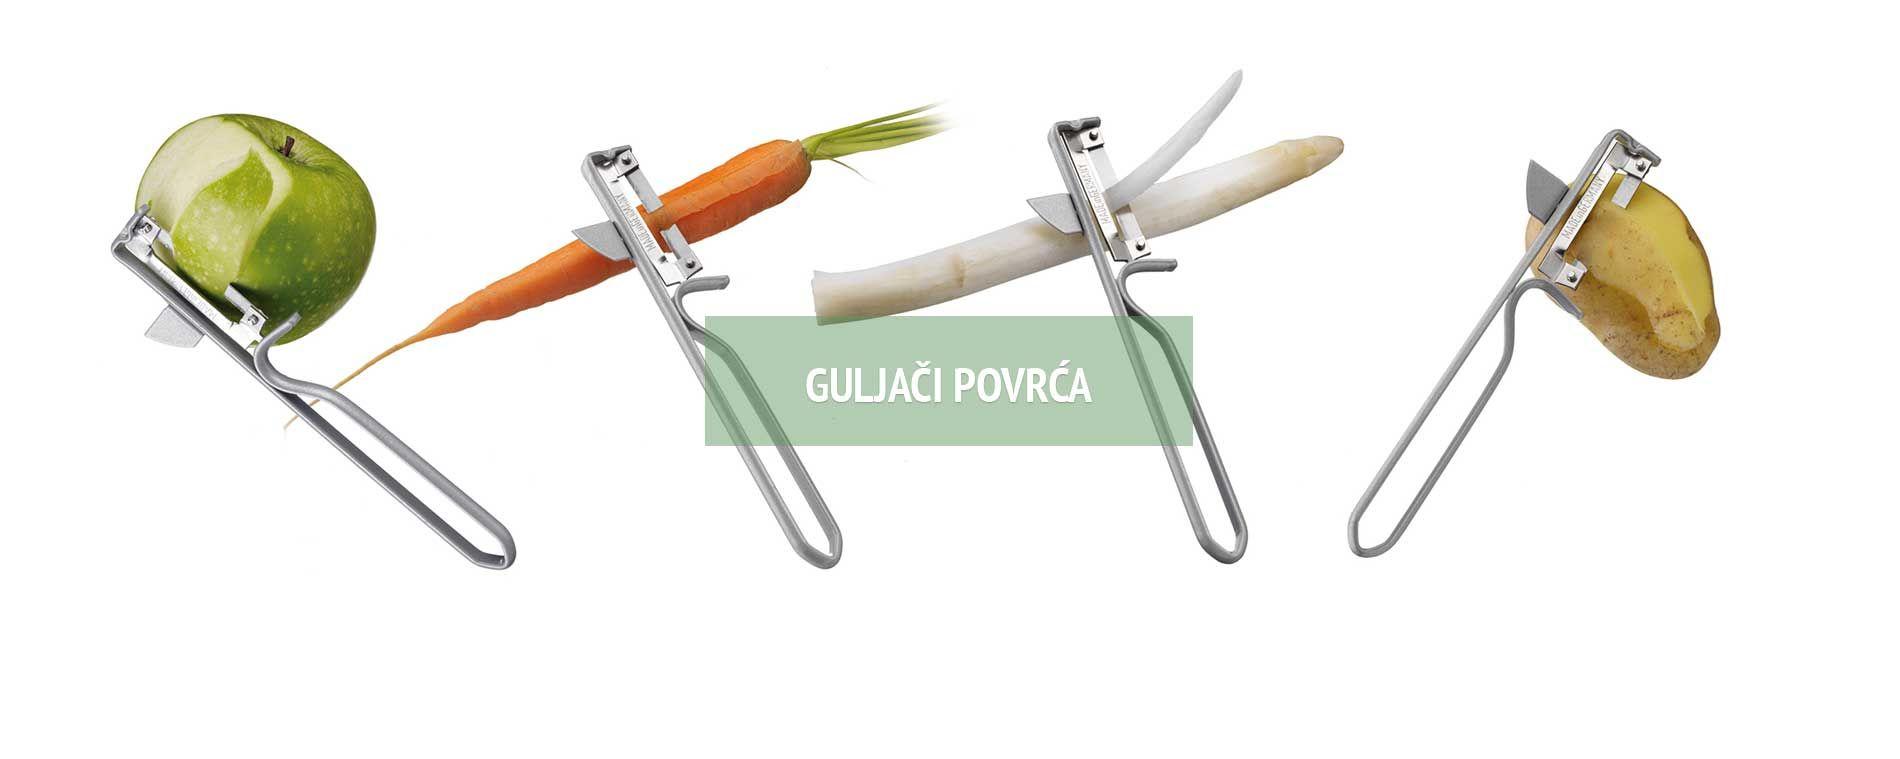 https://www.kuhinja.net/kuhati/hladna-priprema/cistac-krumpira#product_list_order=price